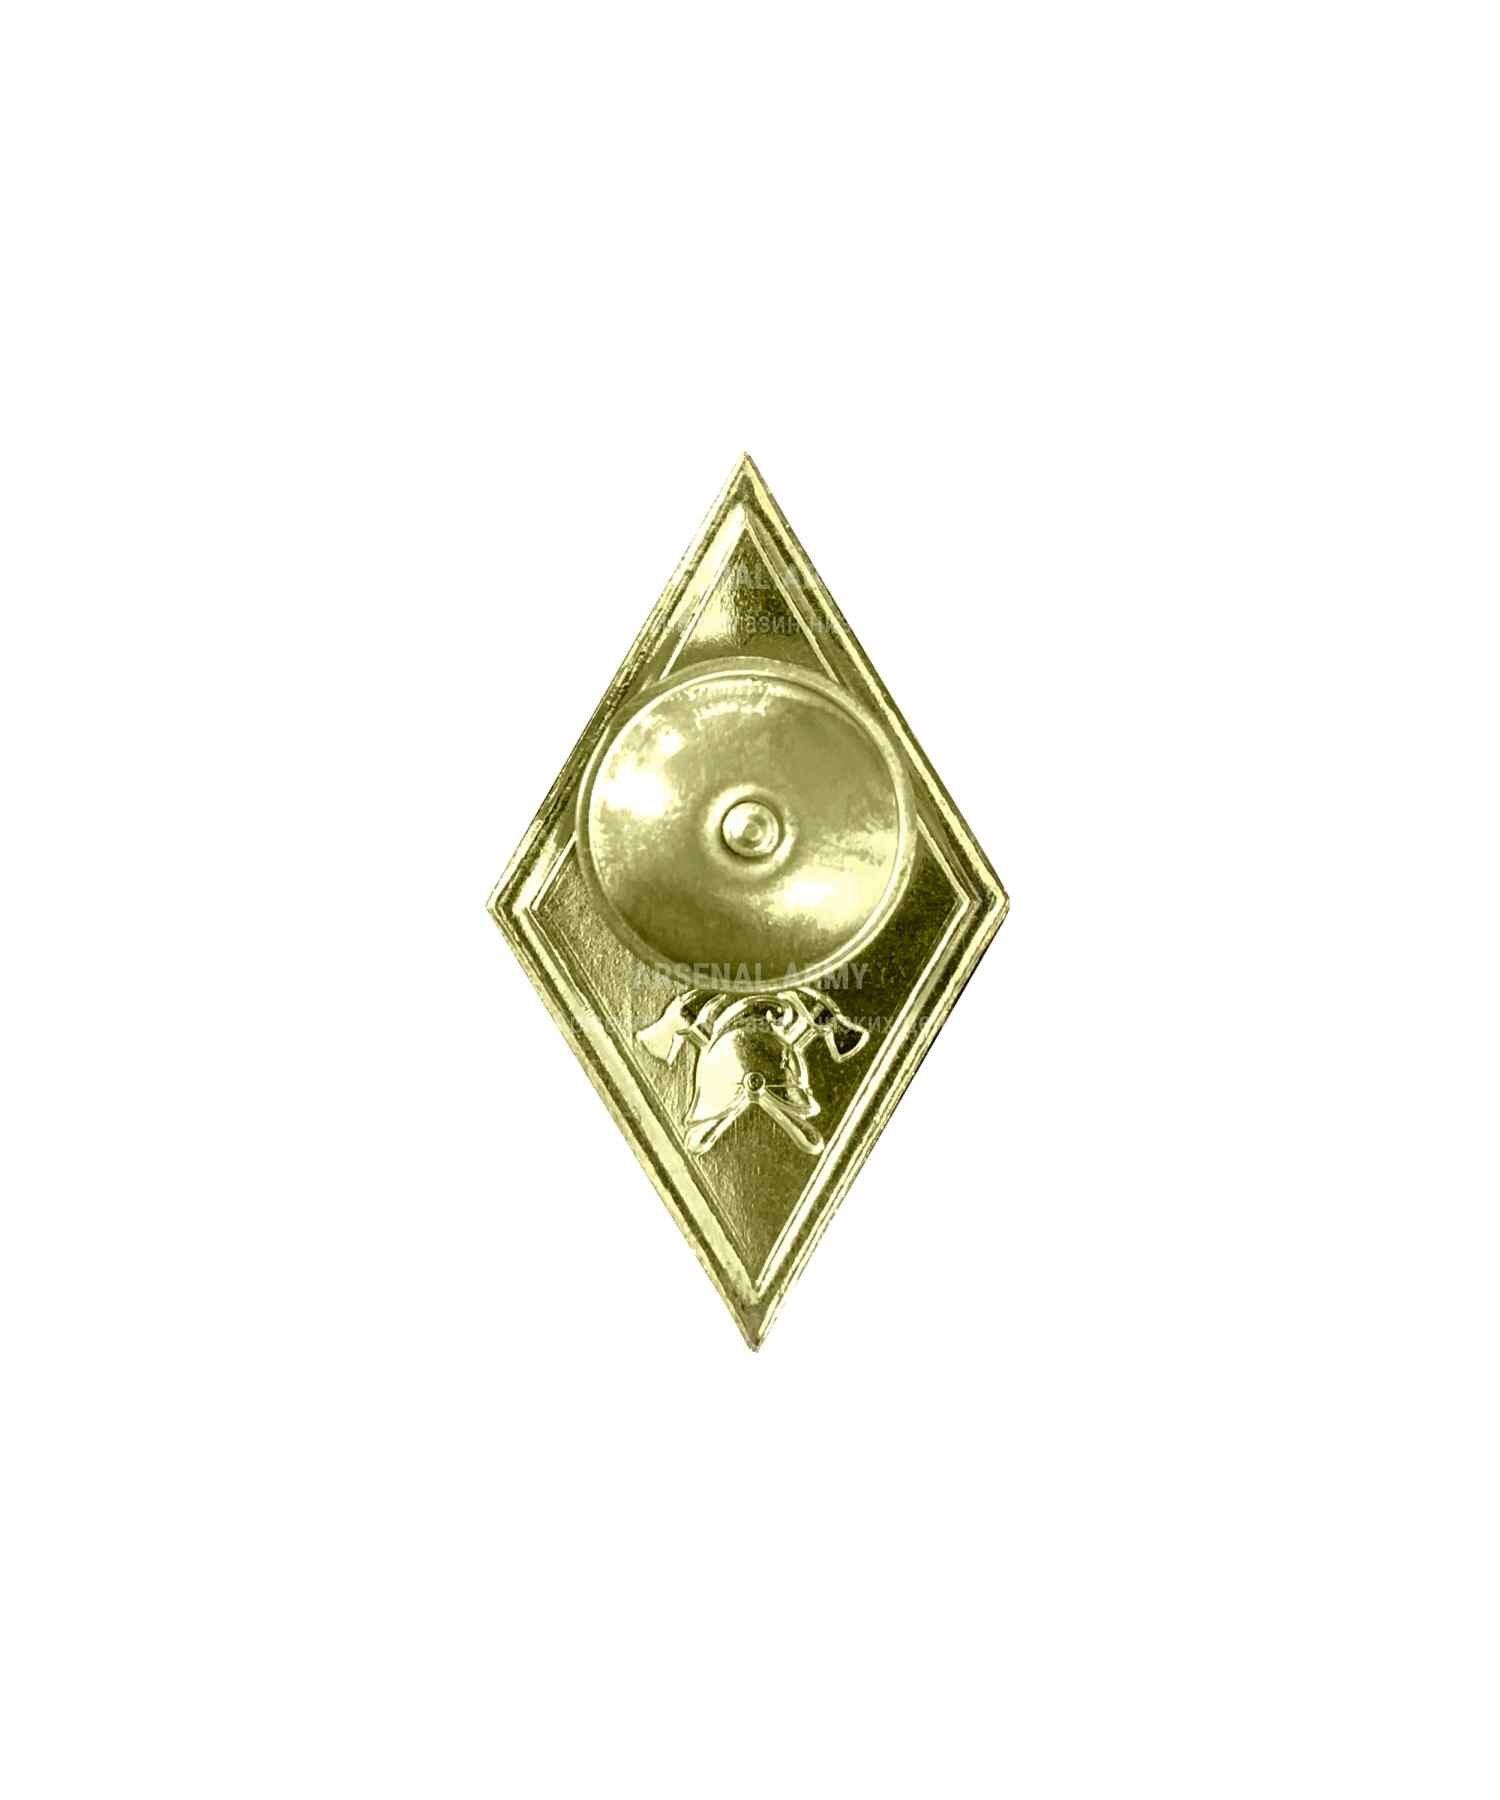 Значок металлический Ромб МЧС Бакалавриат